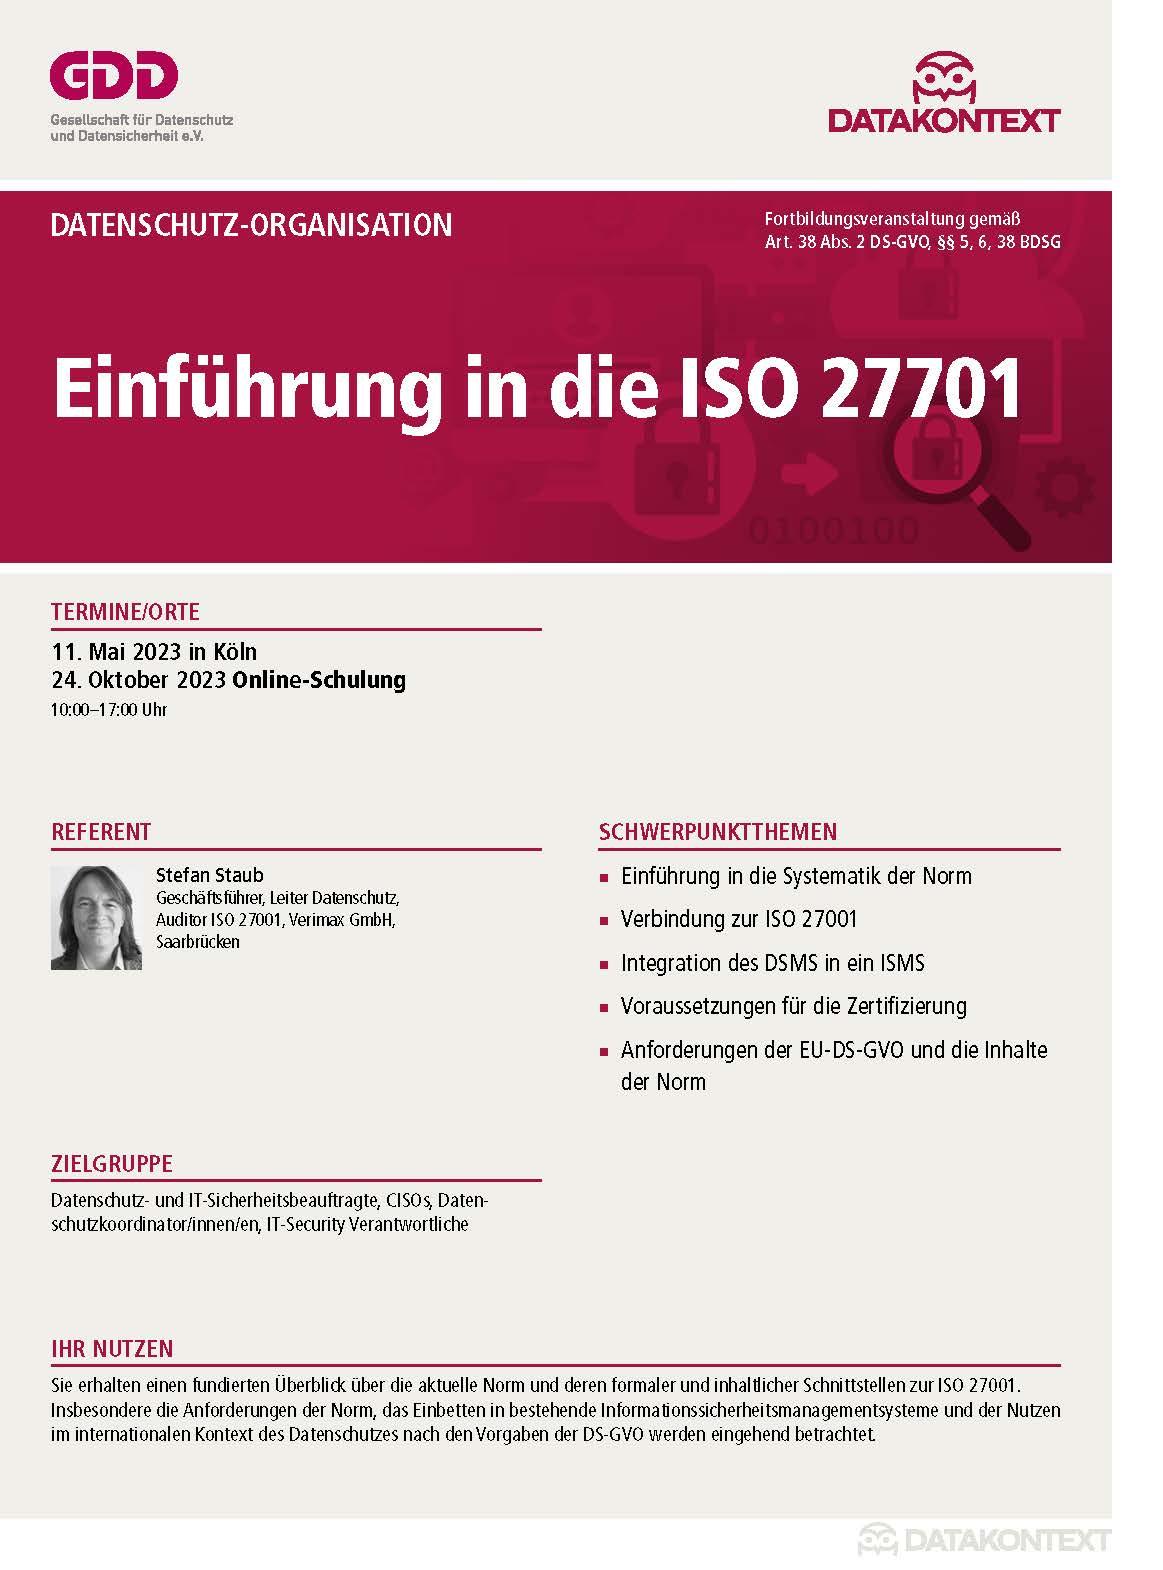 Einführung in die ISO27701